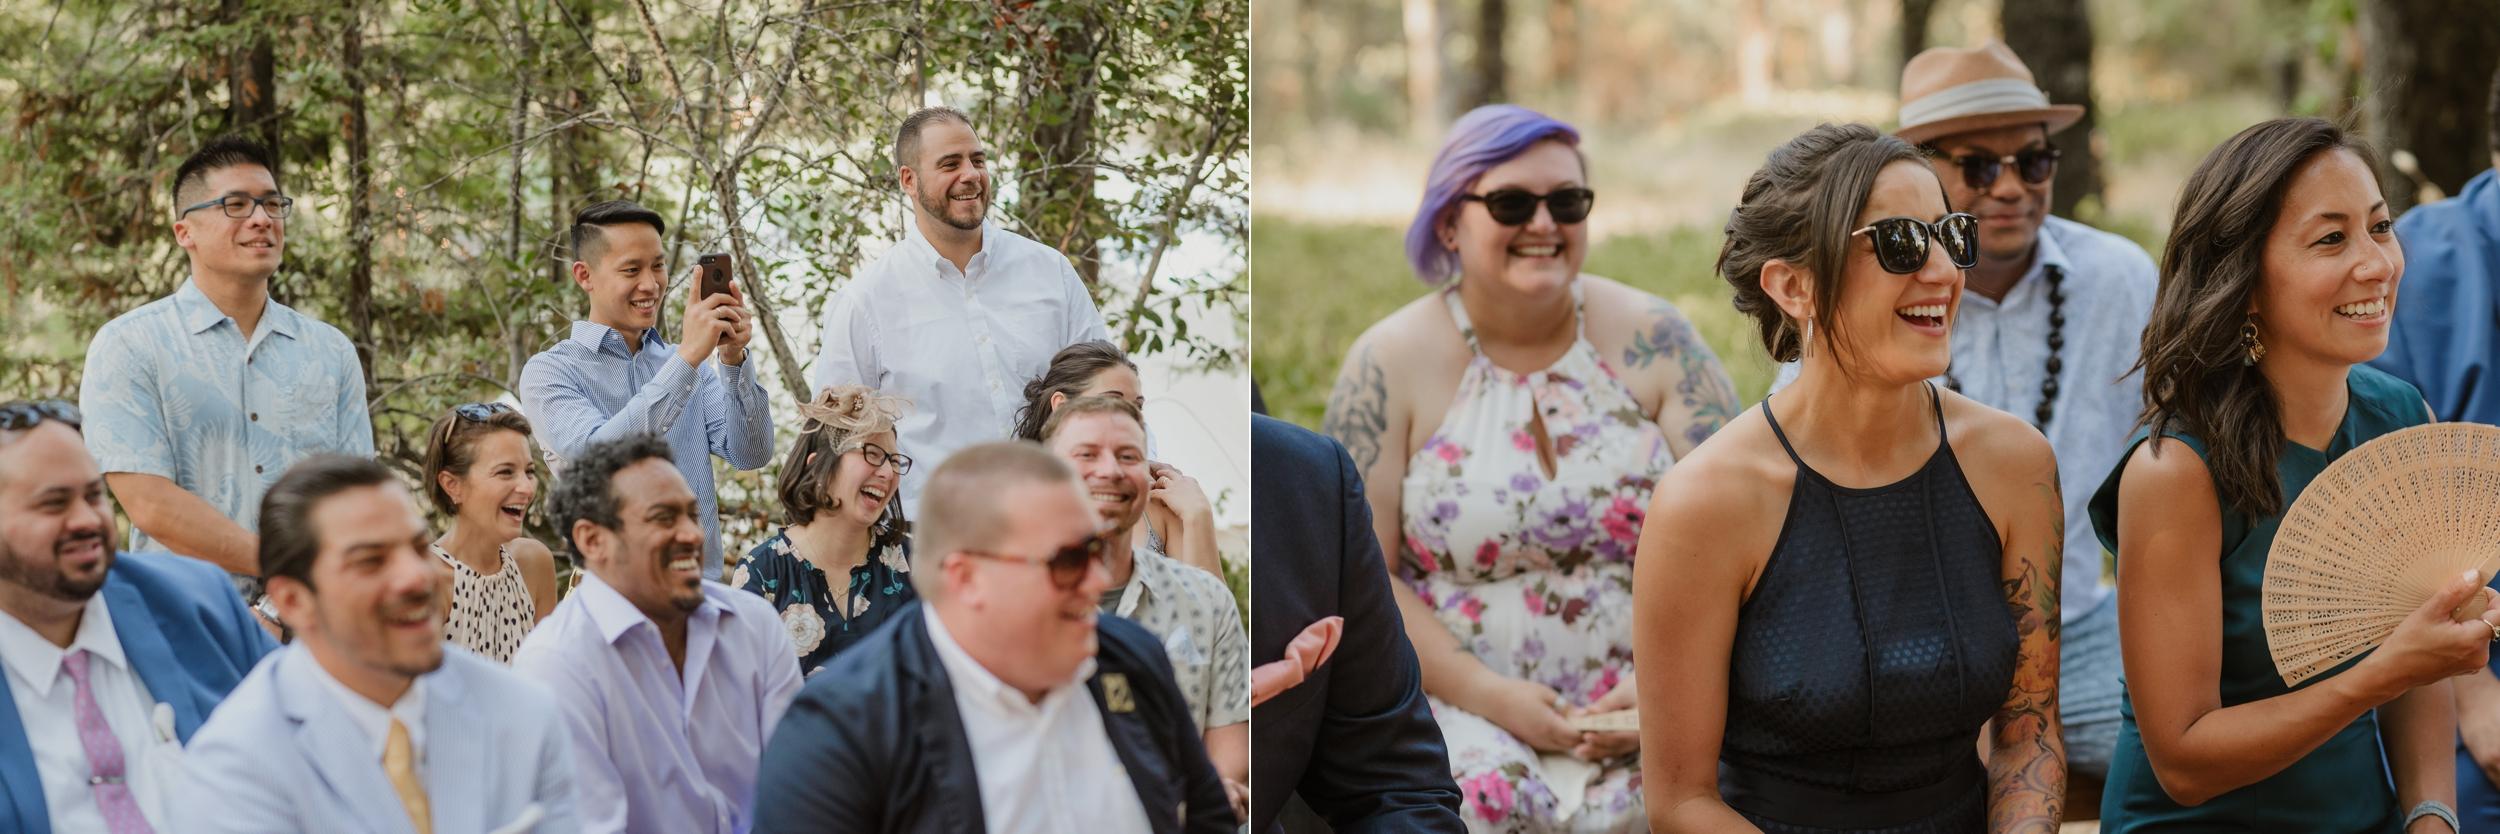 40-ukiah-yokayo-ranch-fall-wedding-vivianchen-250_WEB.jpg